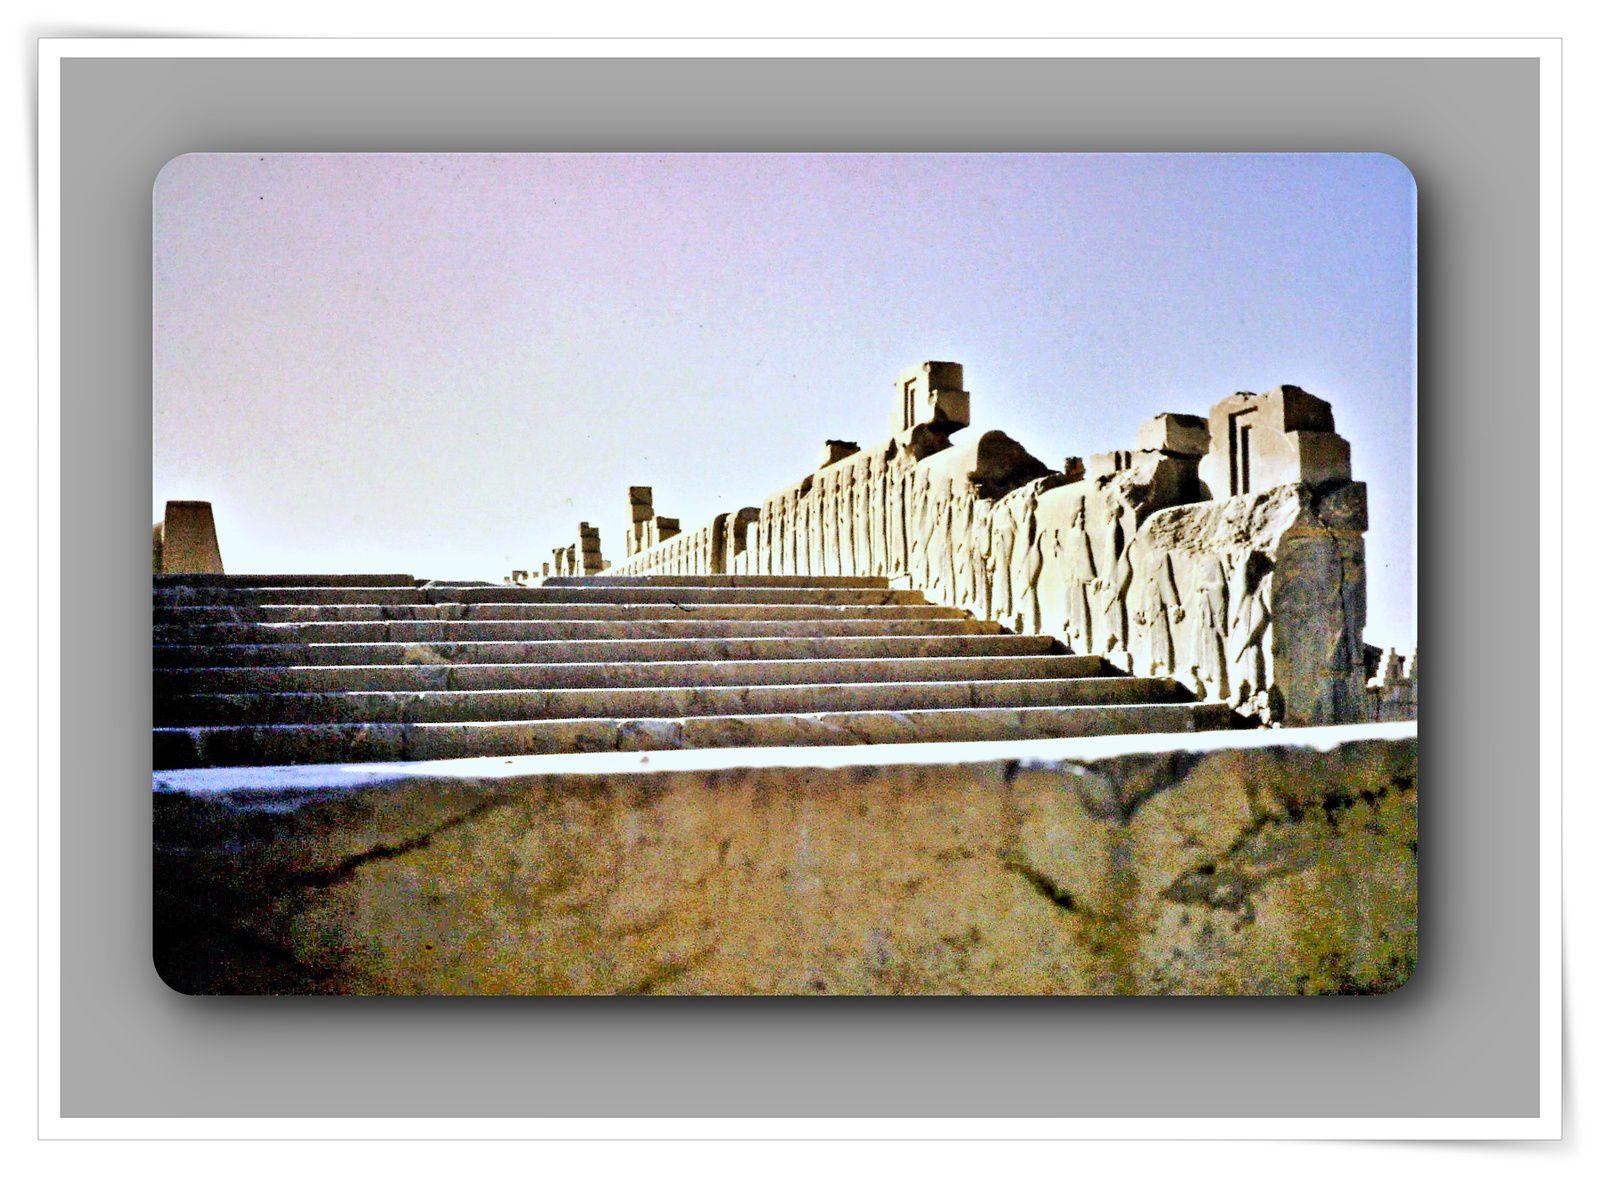 Iran 1974 - diapositives - Persepolis